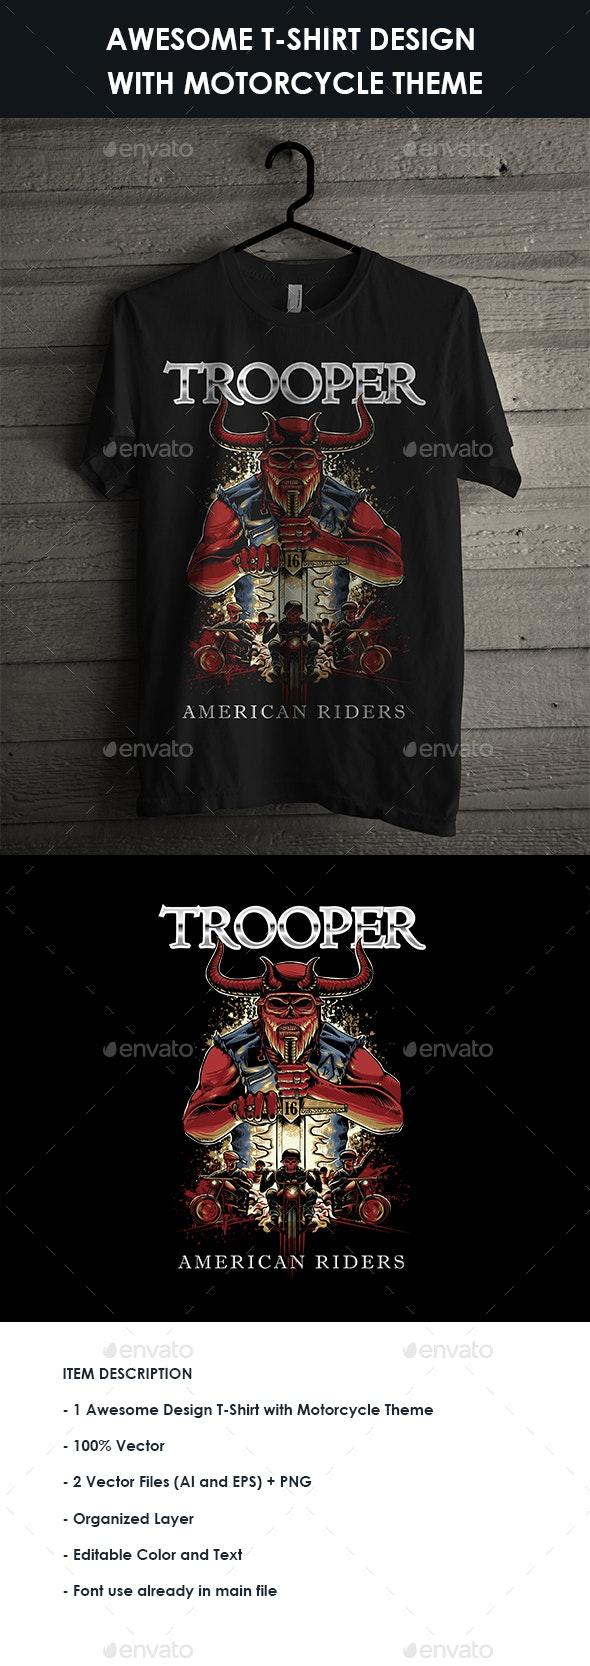 Devil illustration for Motorcycle t-shirt design - Sports & Teams T-Shirts